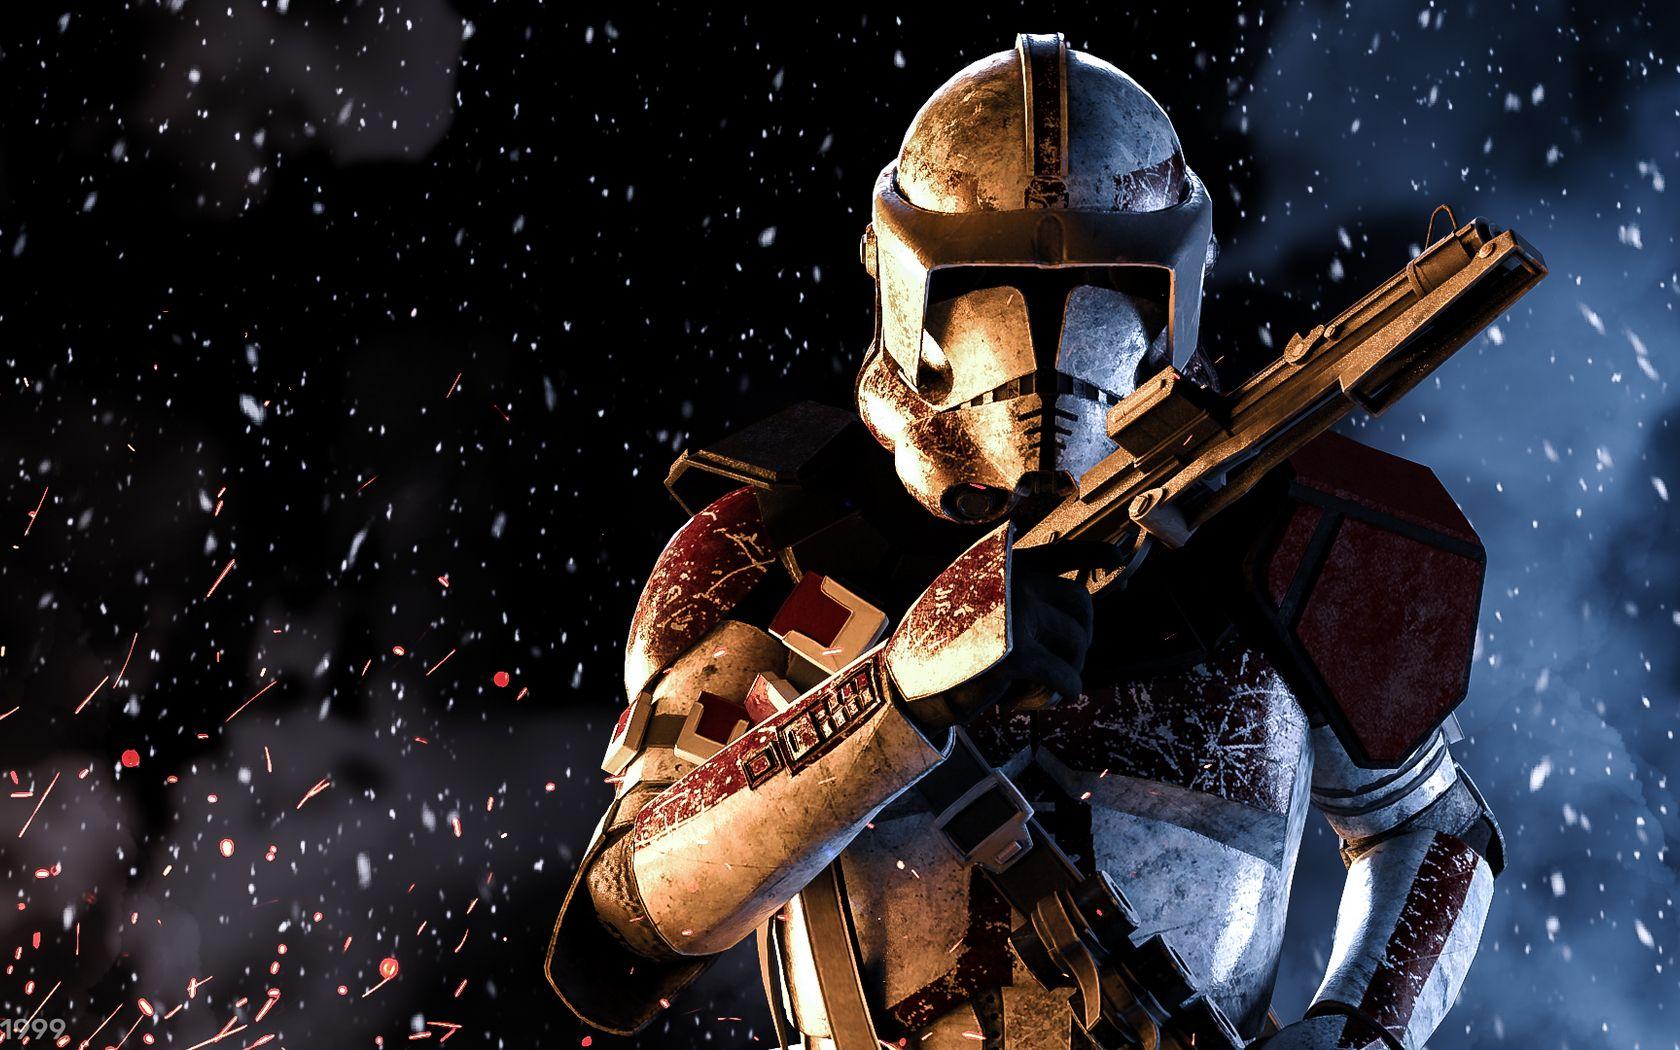 Clone Trooper Wallpaper – Super Cool Background for Your Desktop